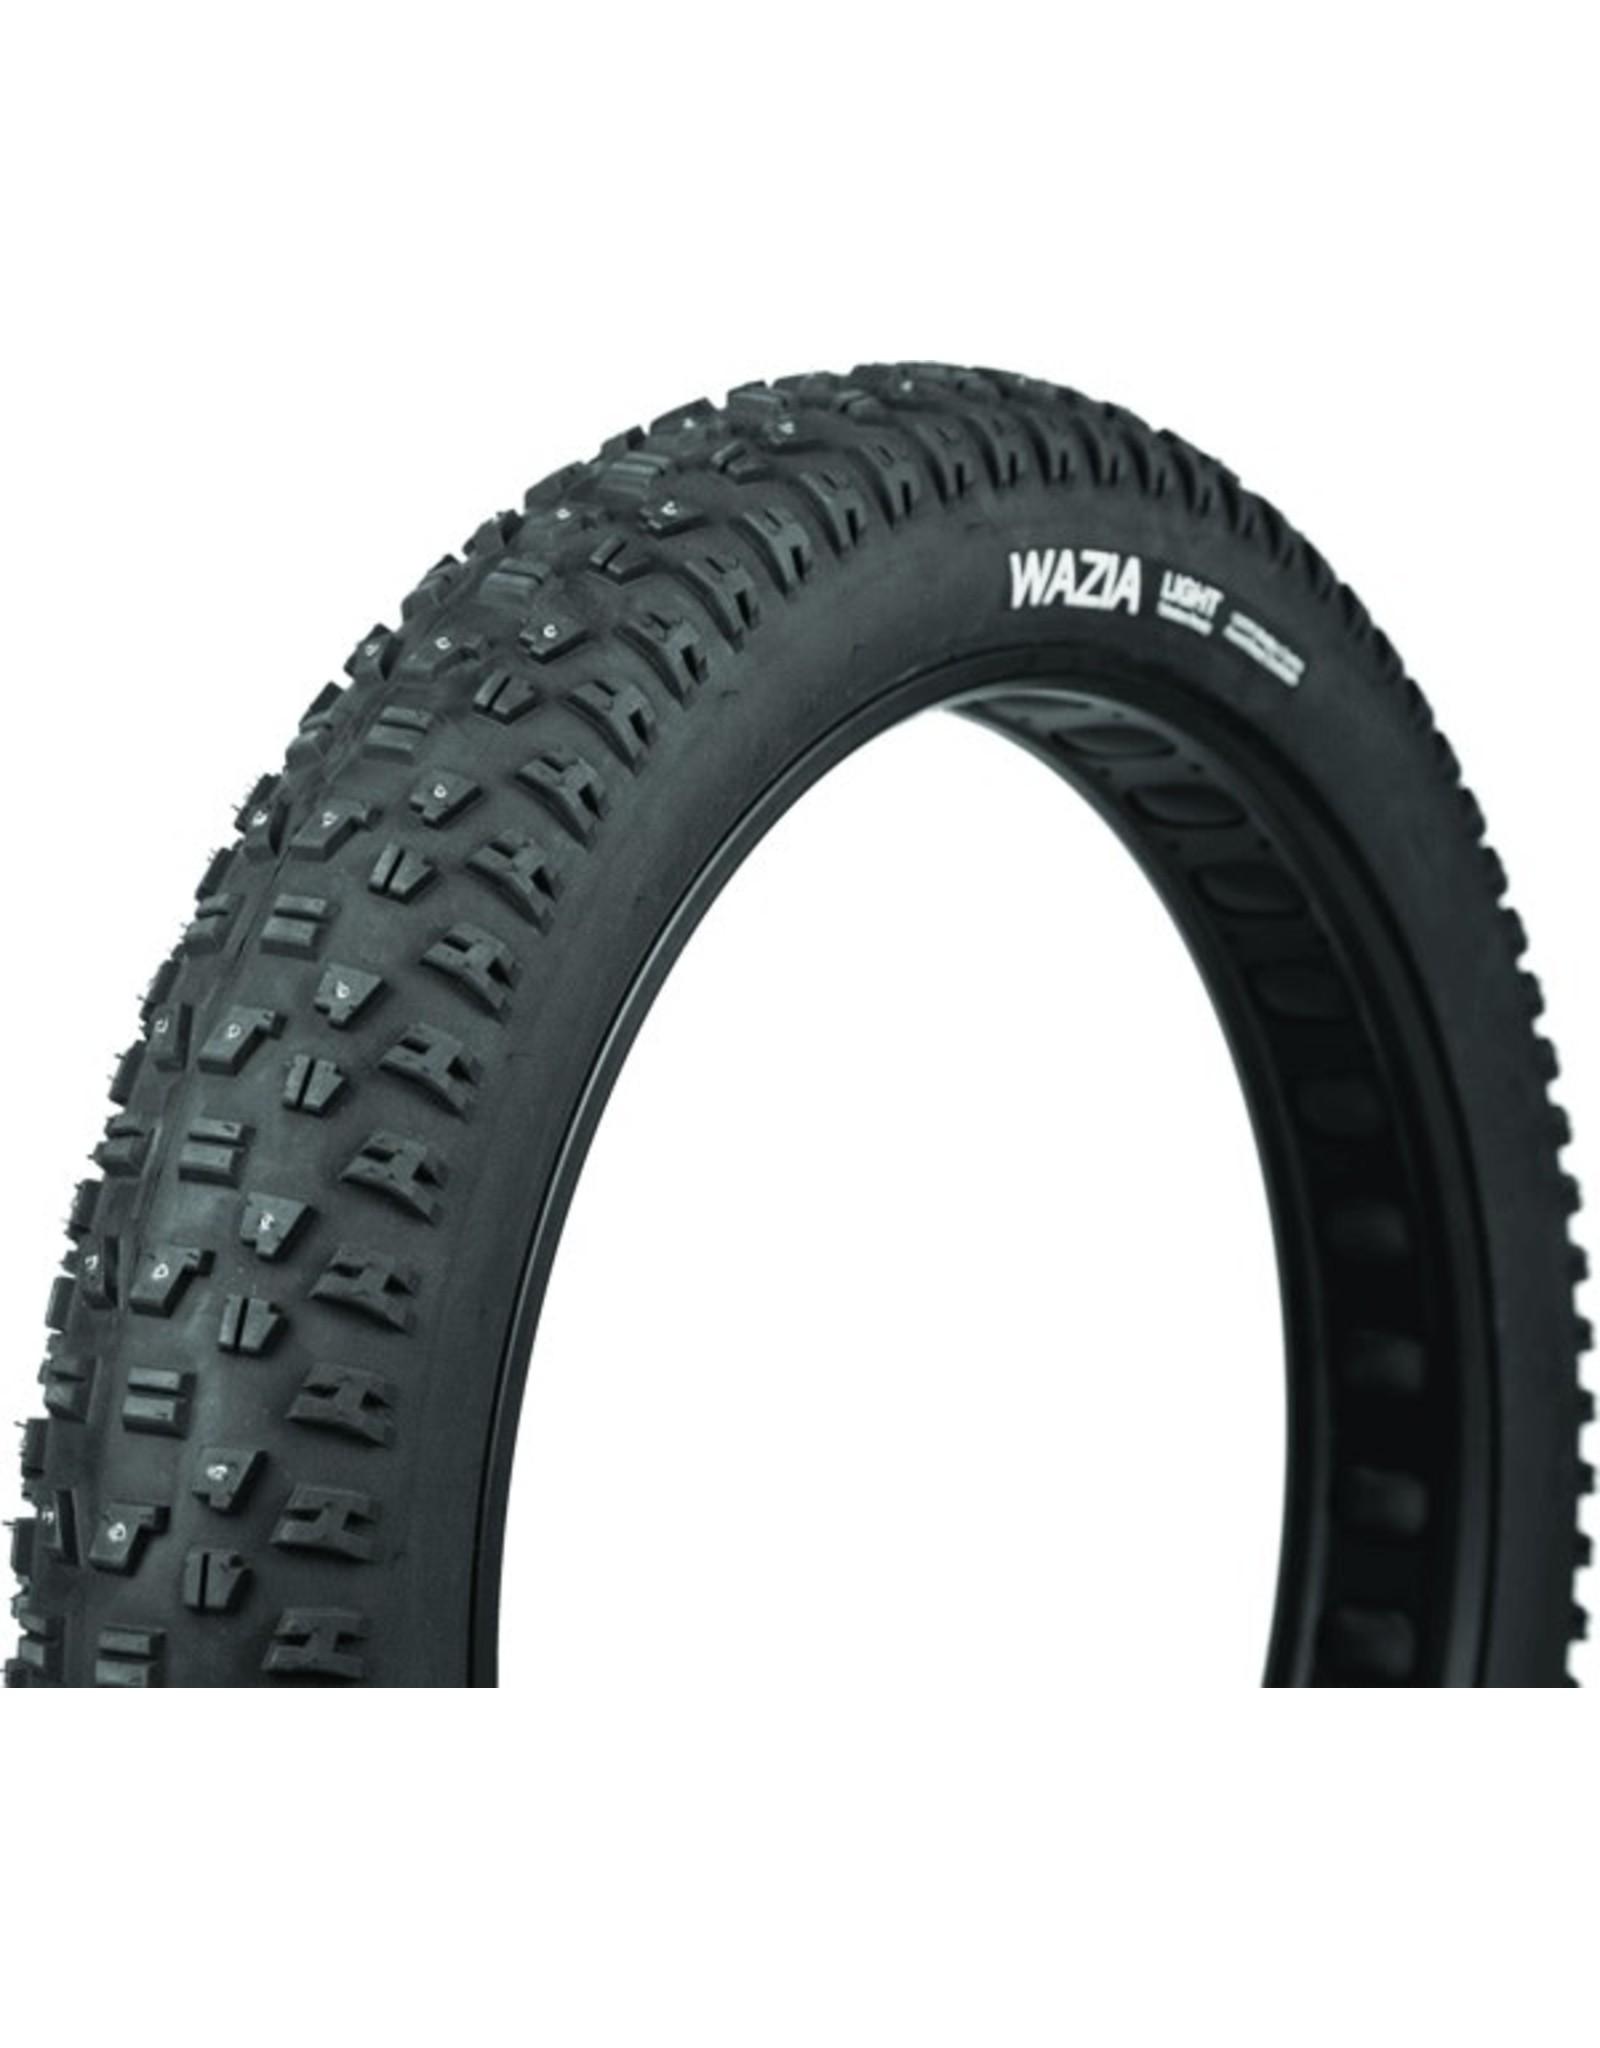 TERRENE Terrene Tires, WAZIA 26x4,6 LT CR CL 120TPI